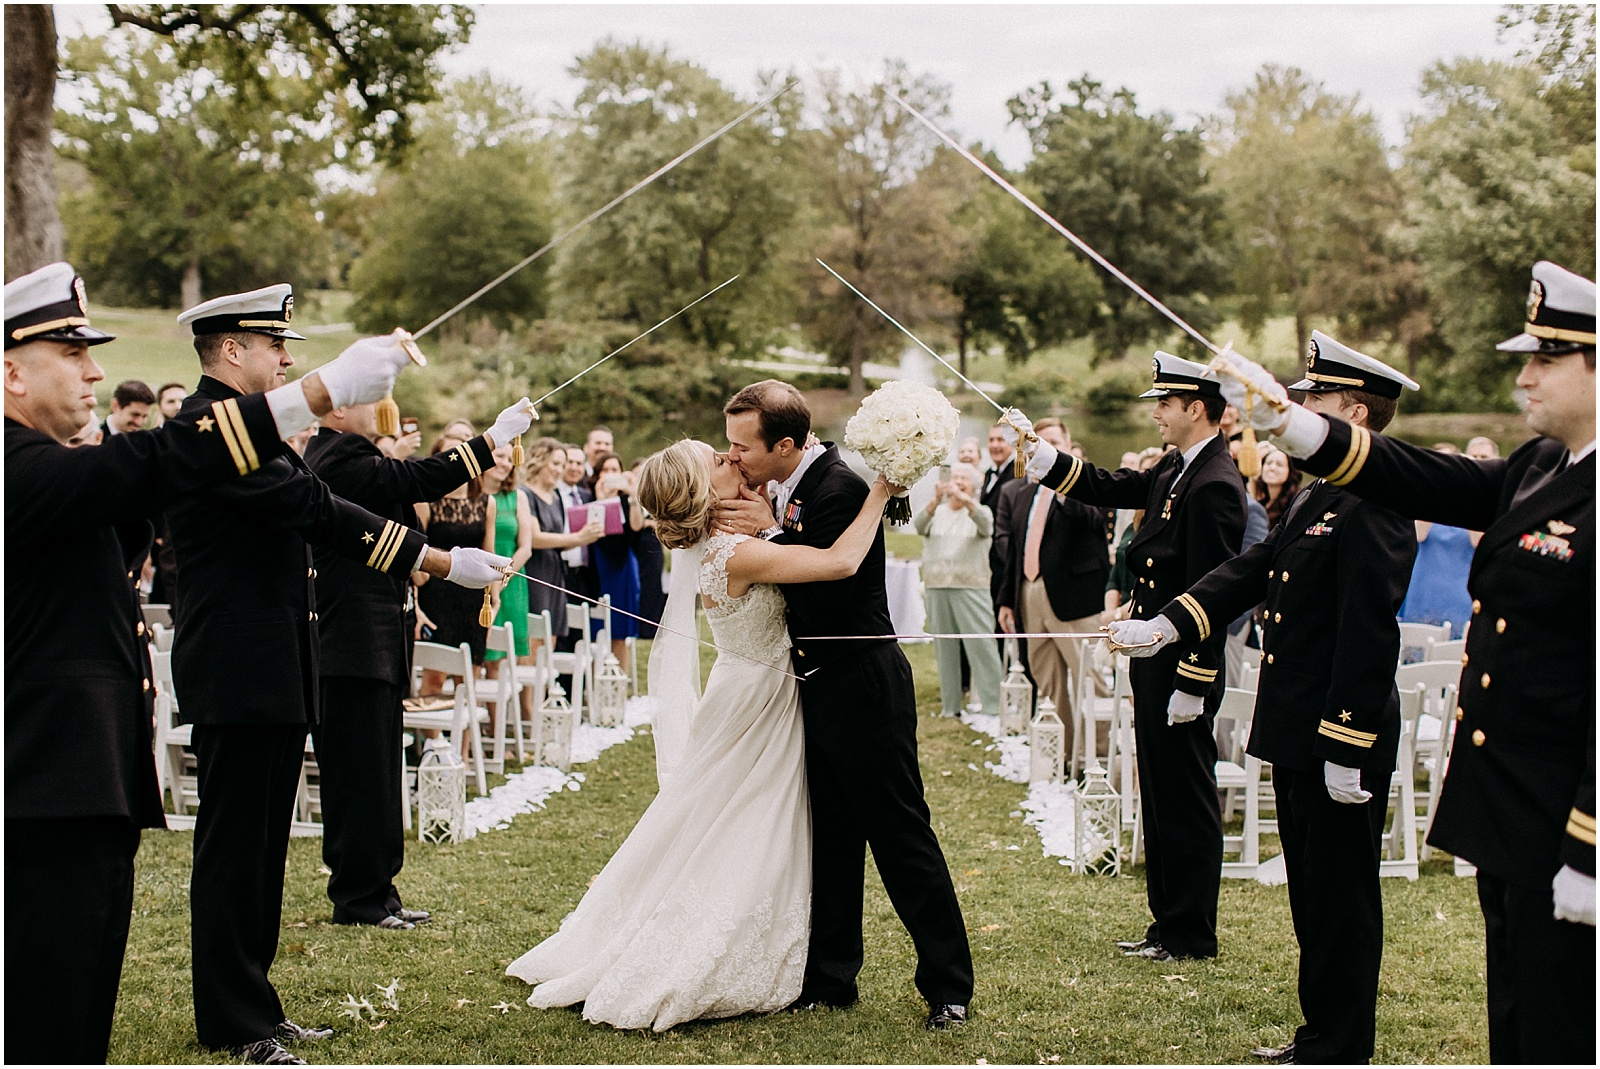 glen_echo_st_louis_mo_wedding_0115.jpg